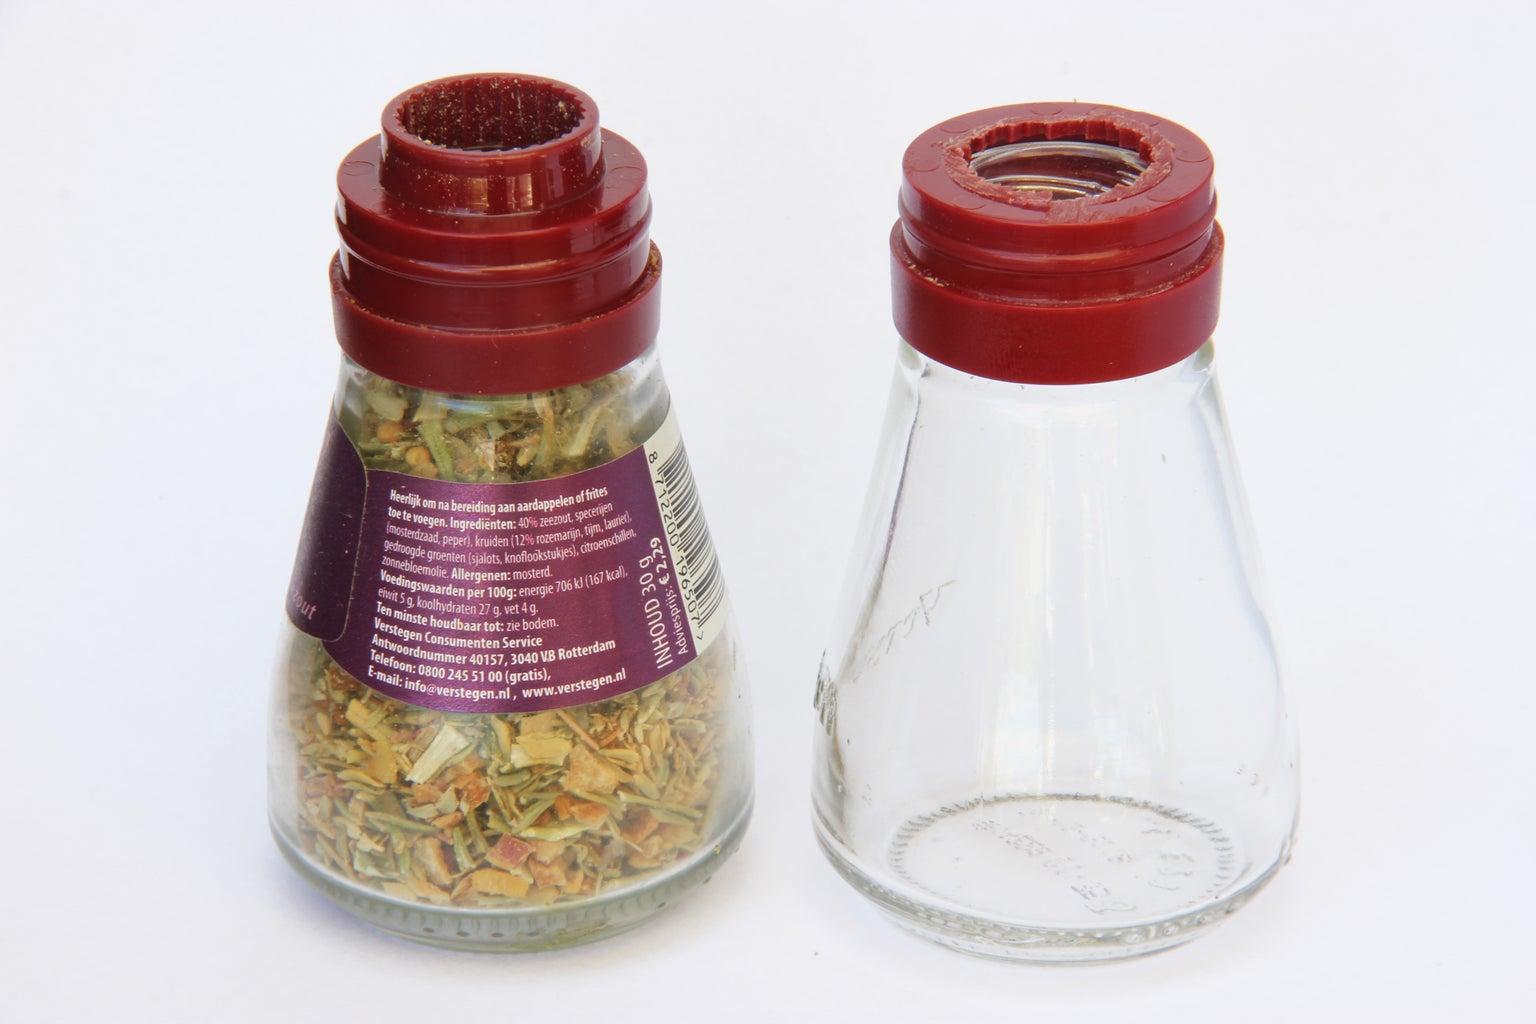 Prepare the Spice Jar